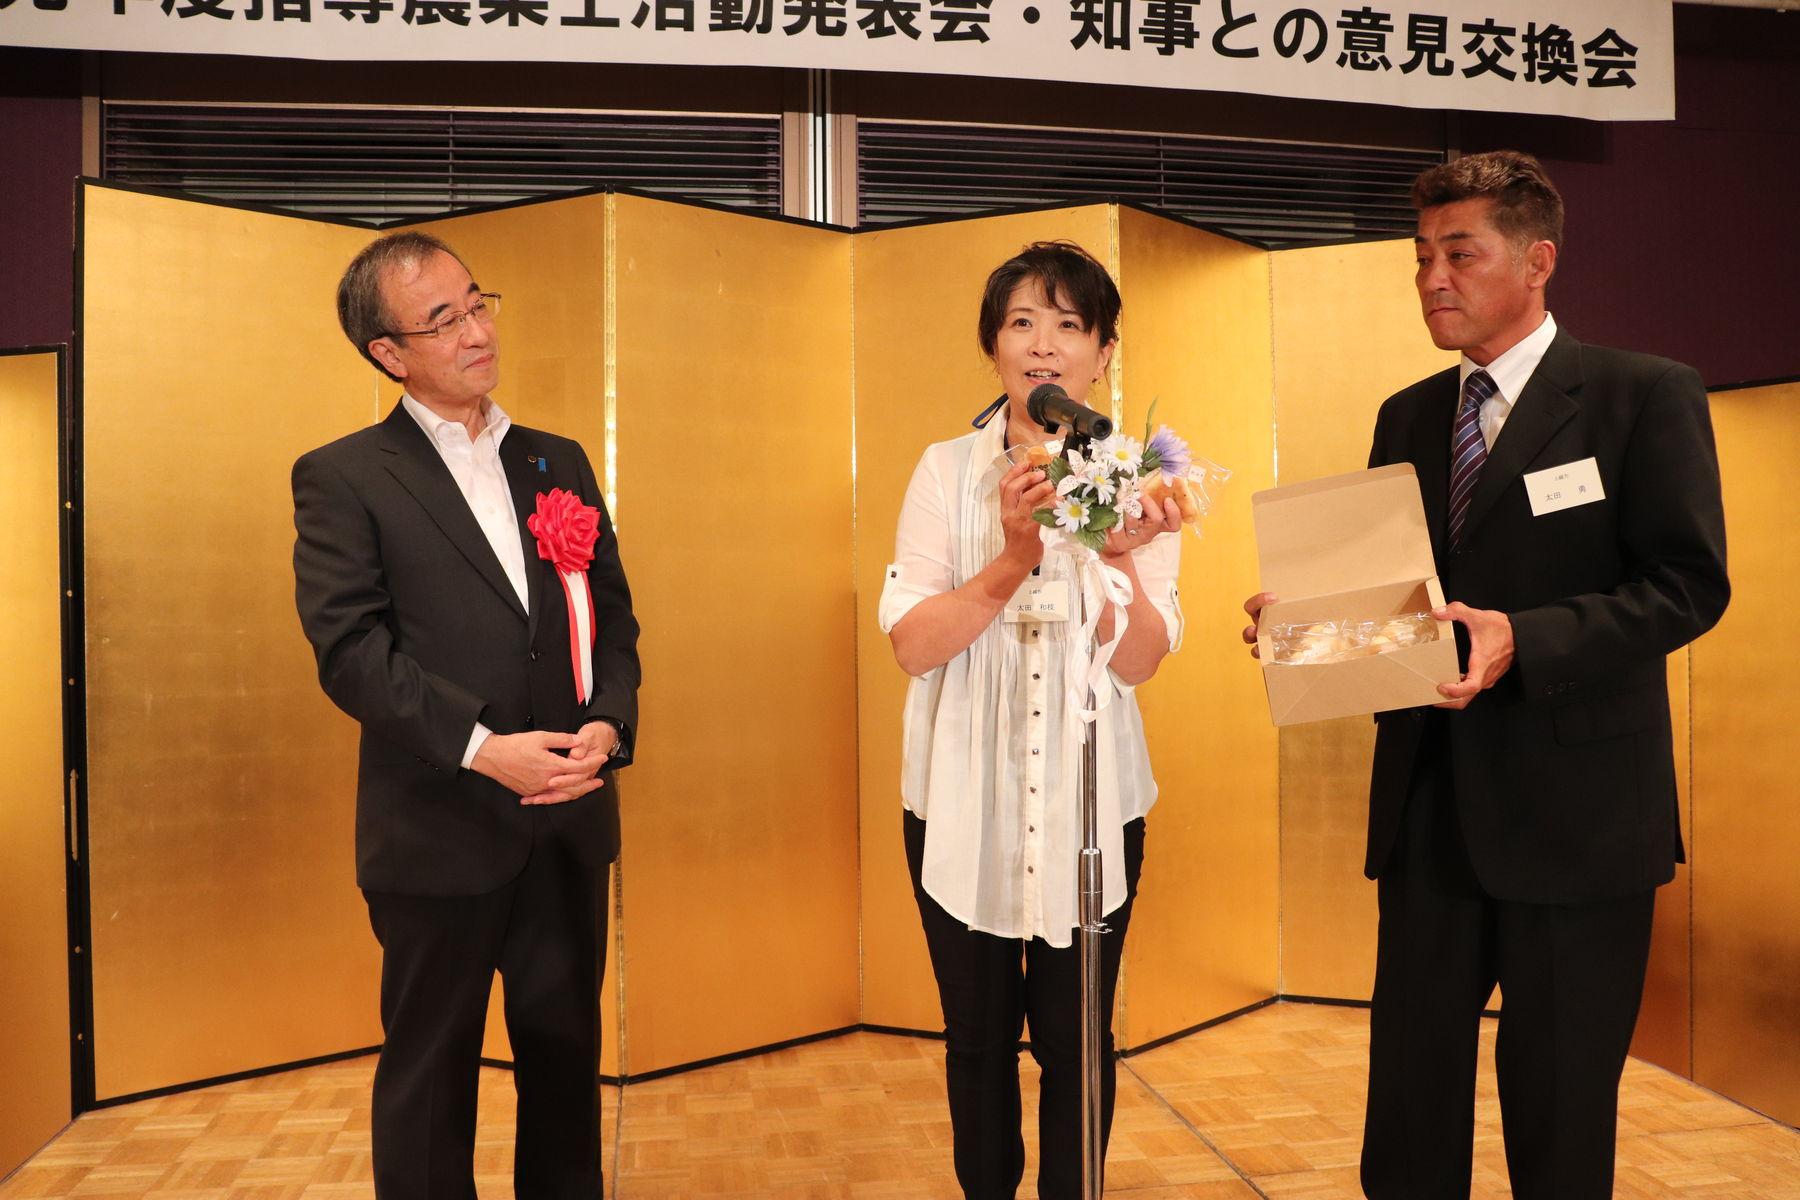 新潟県知事との情報交換会